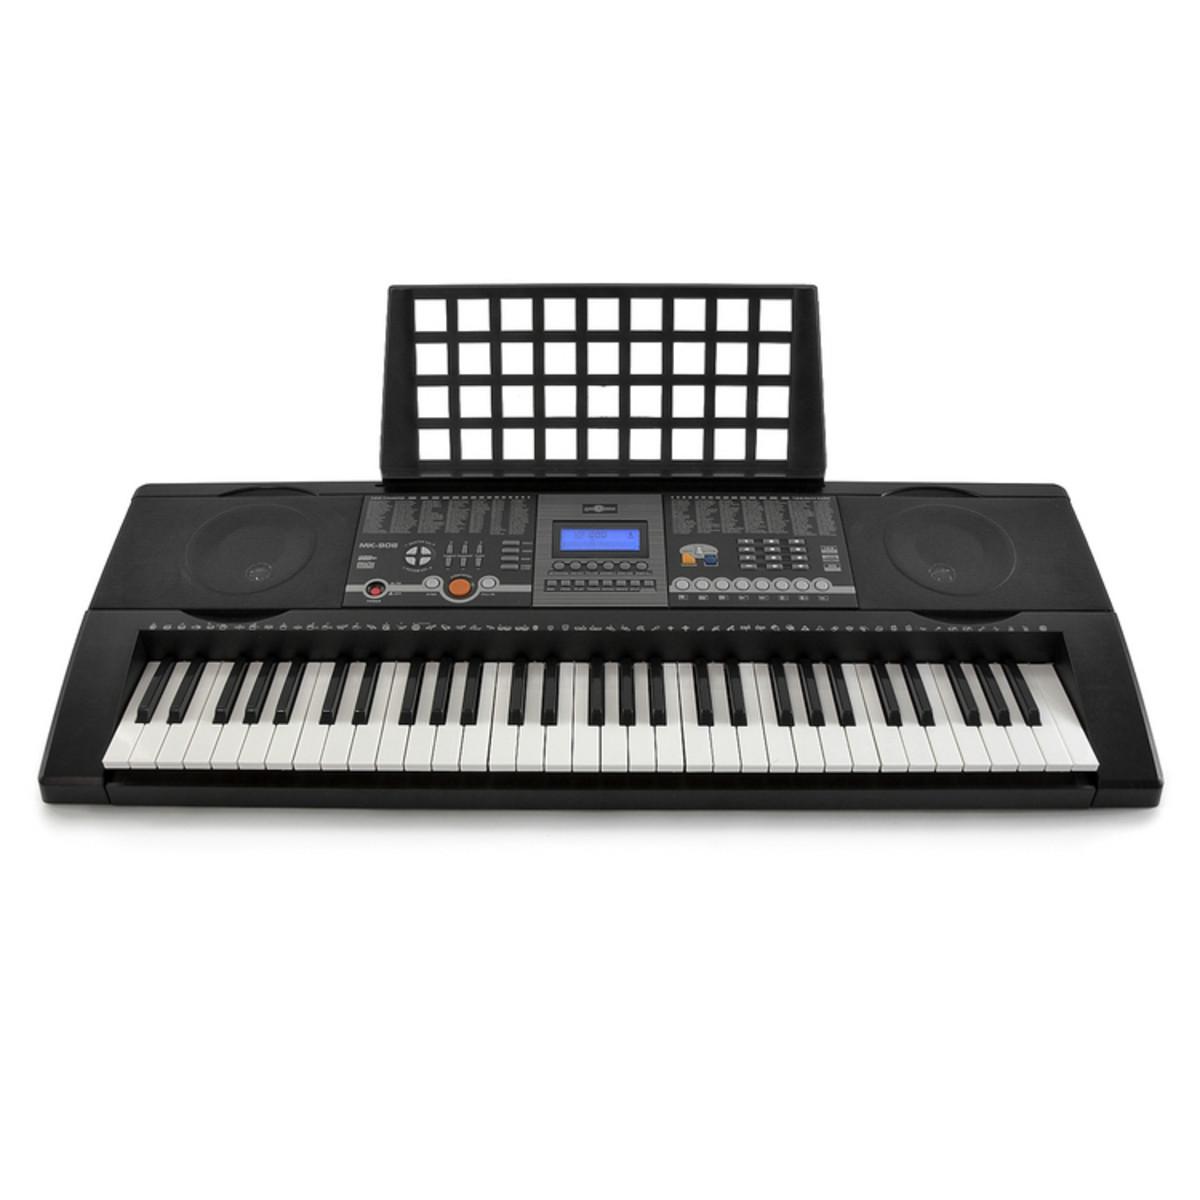 clavier mk 906 avec usb midi par gear4music ex d mo. Black Bedroom Furniture Sets. Home Design Ideas